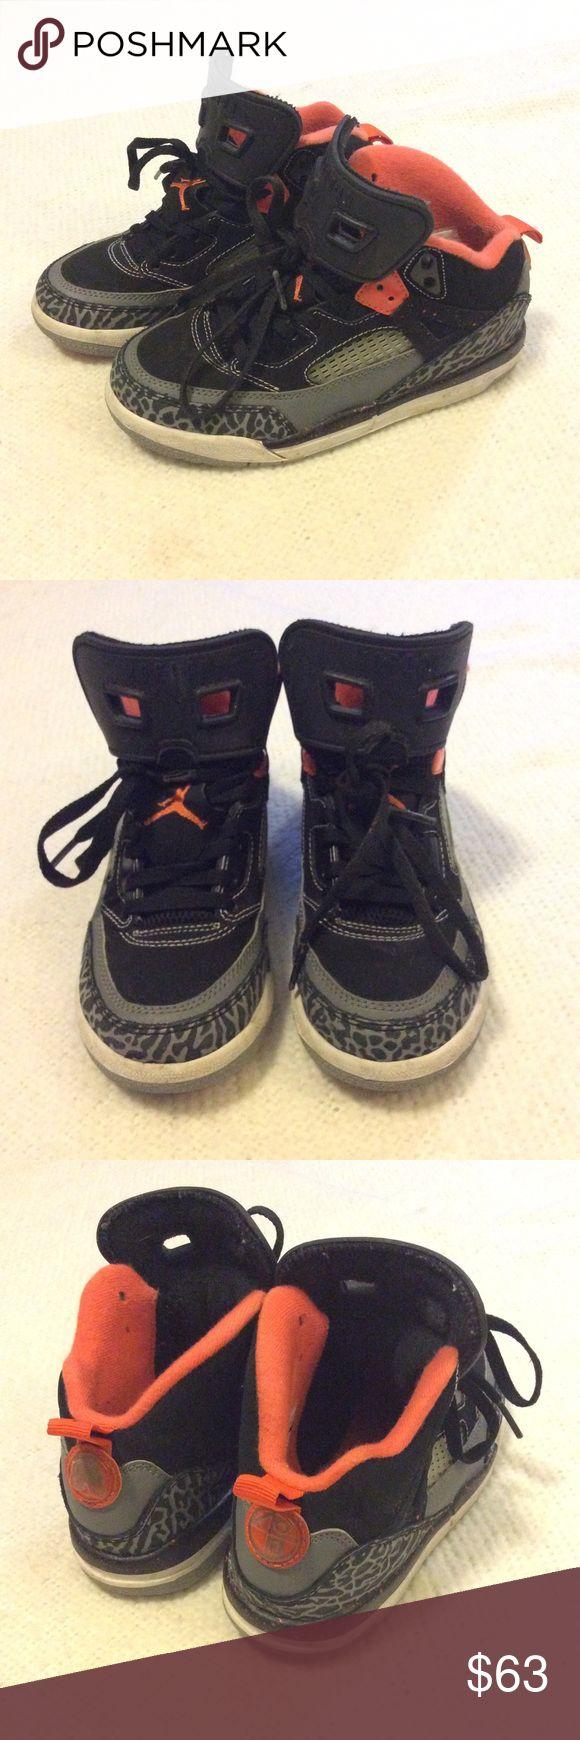 Boys Air Jordan Spizike Sneakers Nice Boys Jordans. GUC. Ships next business day. Air Jordan Shoes Sneakers